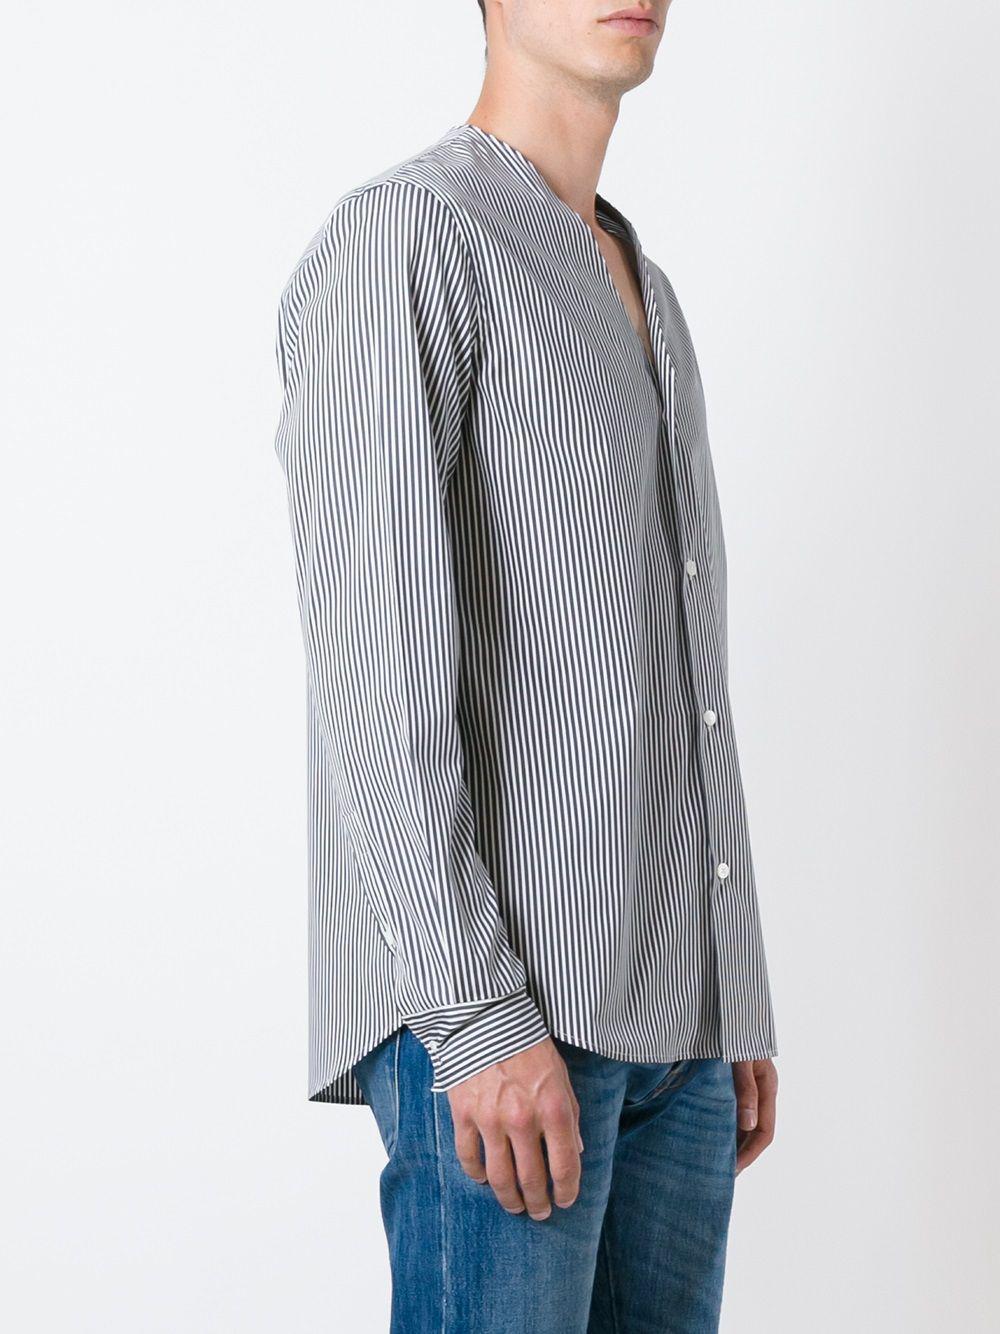 Marni Cotton Striped V-neck Shirt in Blue for Men